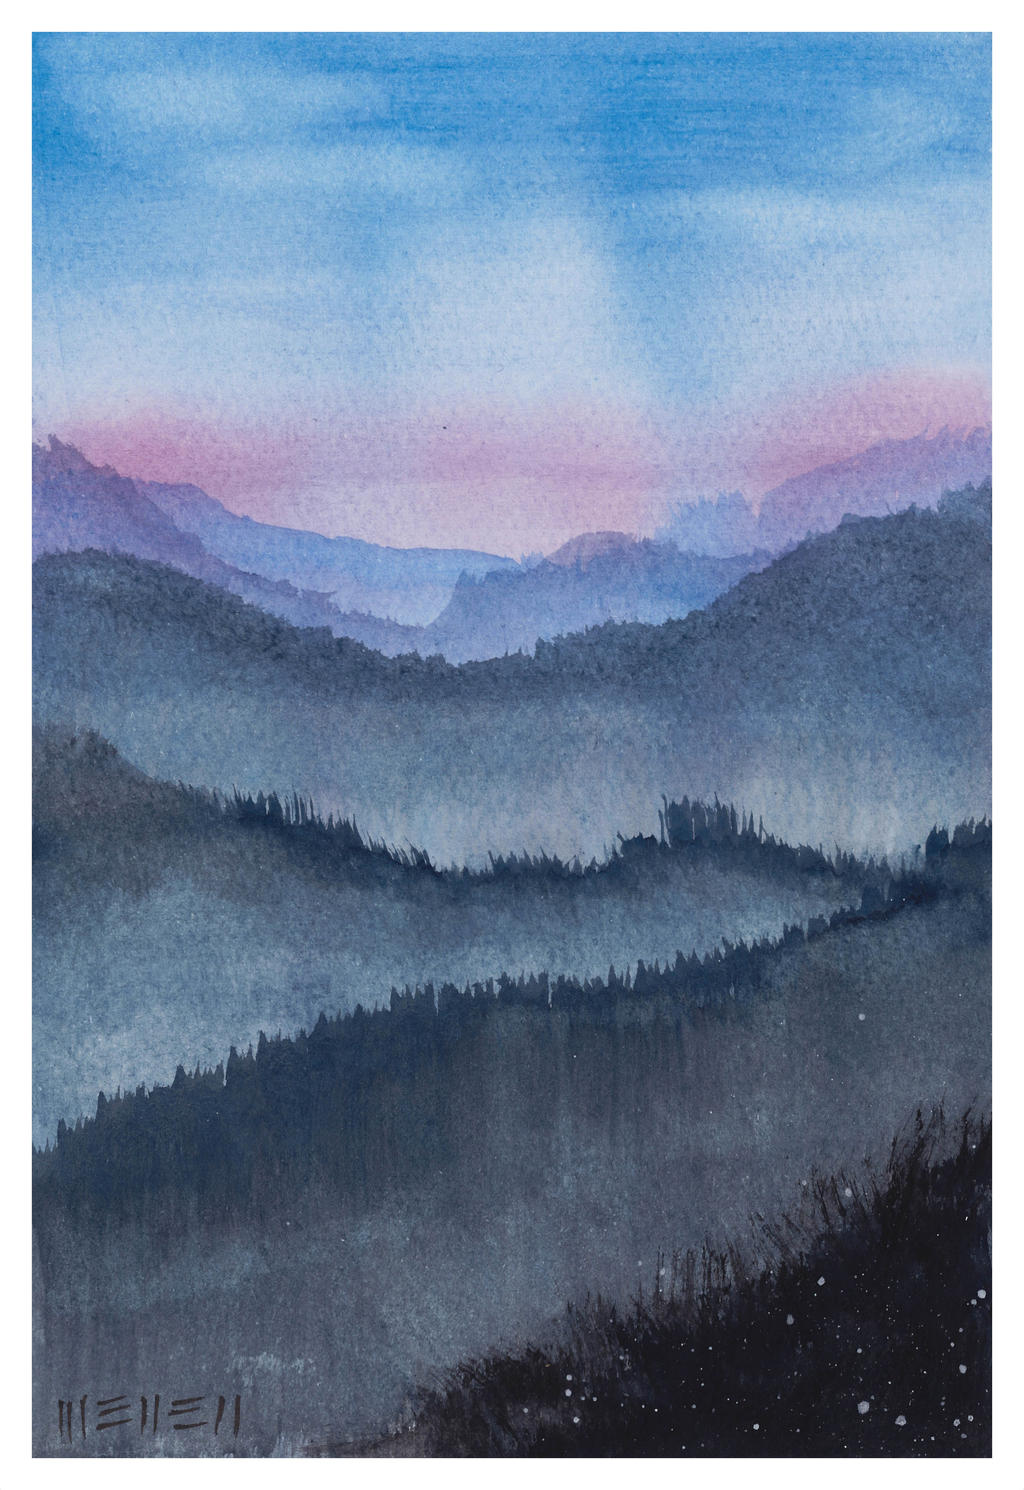 Mountain sound by dominikmellen